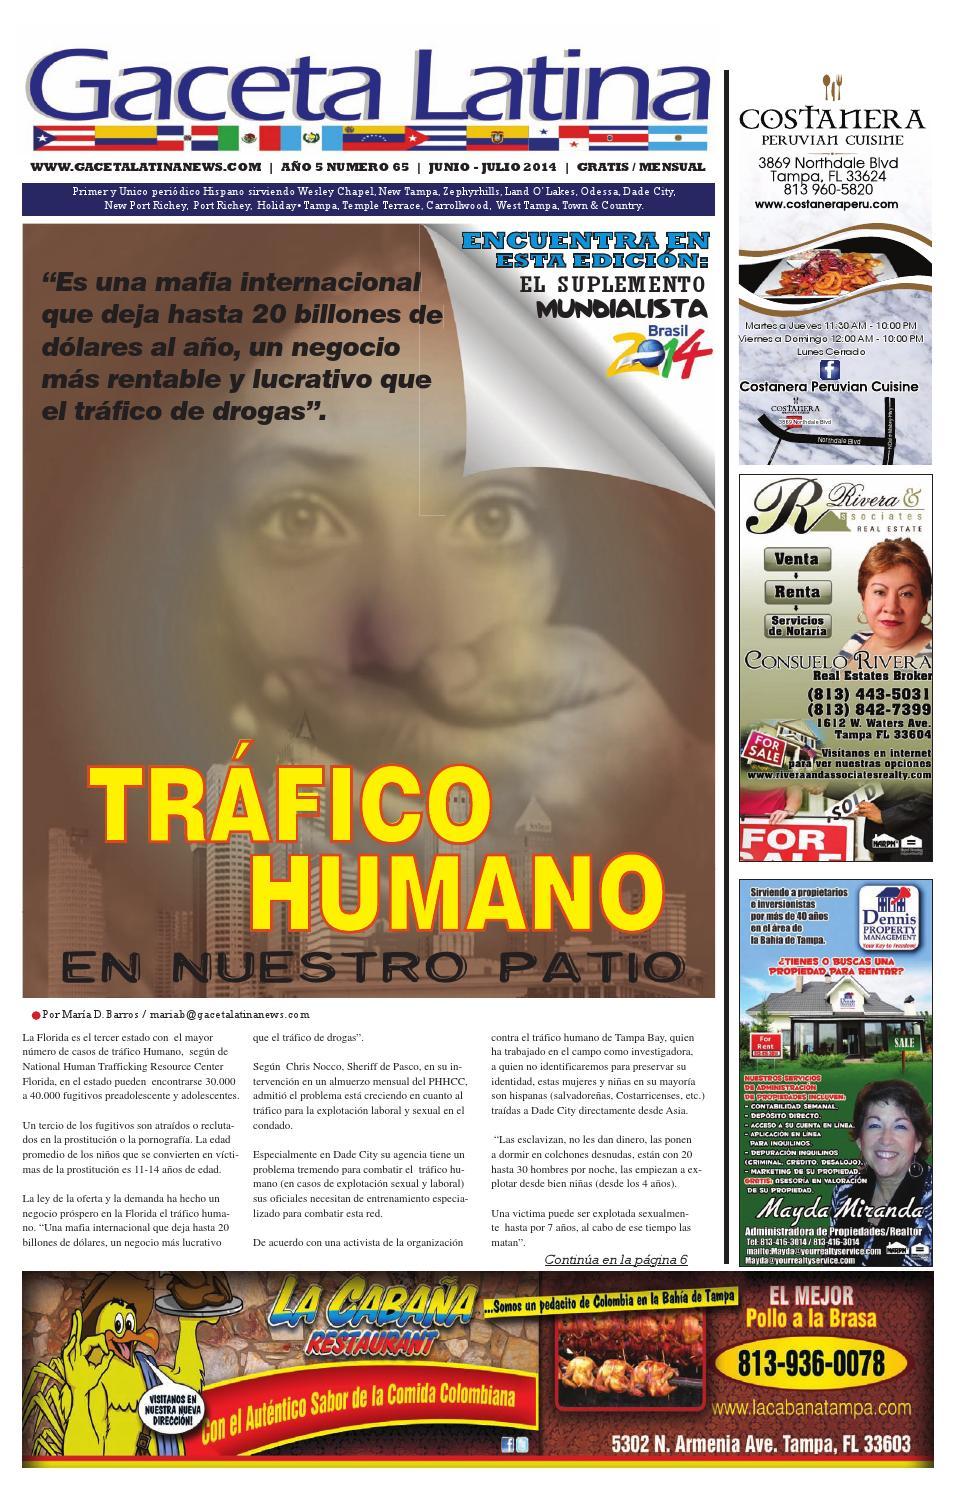 Gaceta Latina June-July 2014. by Gaceta Latina Newspaper - issuu